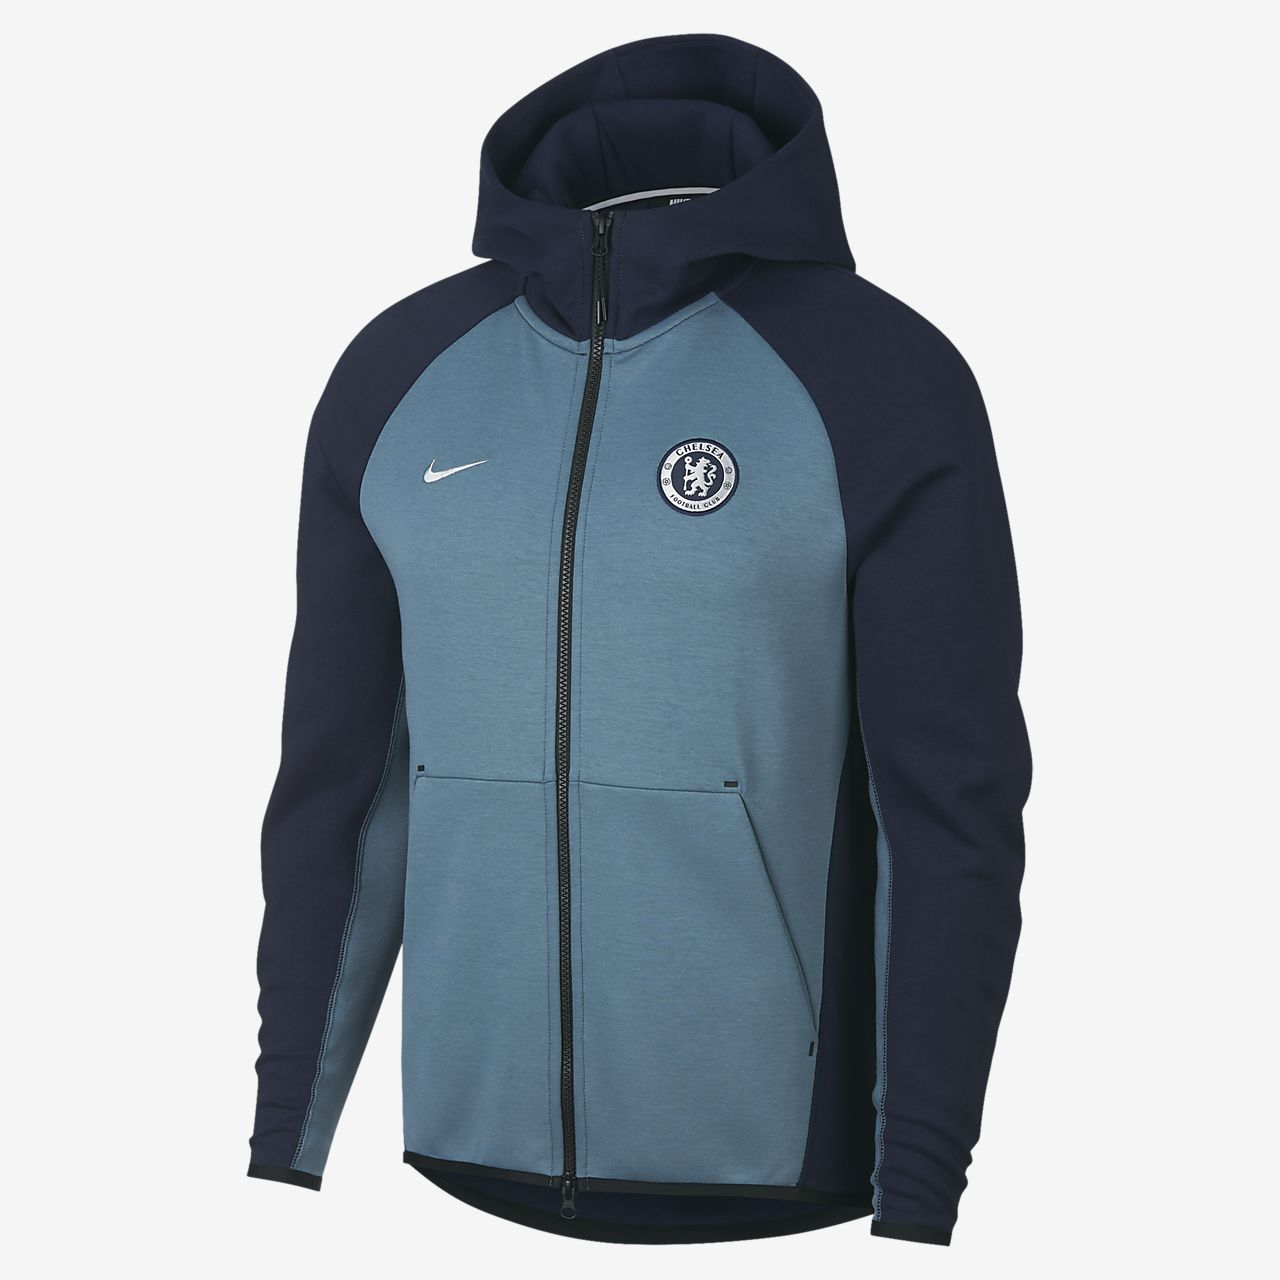 fa4467f5ccb1 Chelsea FC Tech Fleece Men s Full-Zip Hoodie. Nike.com GB